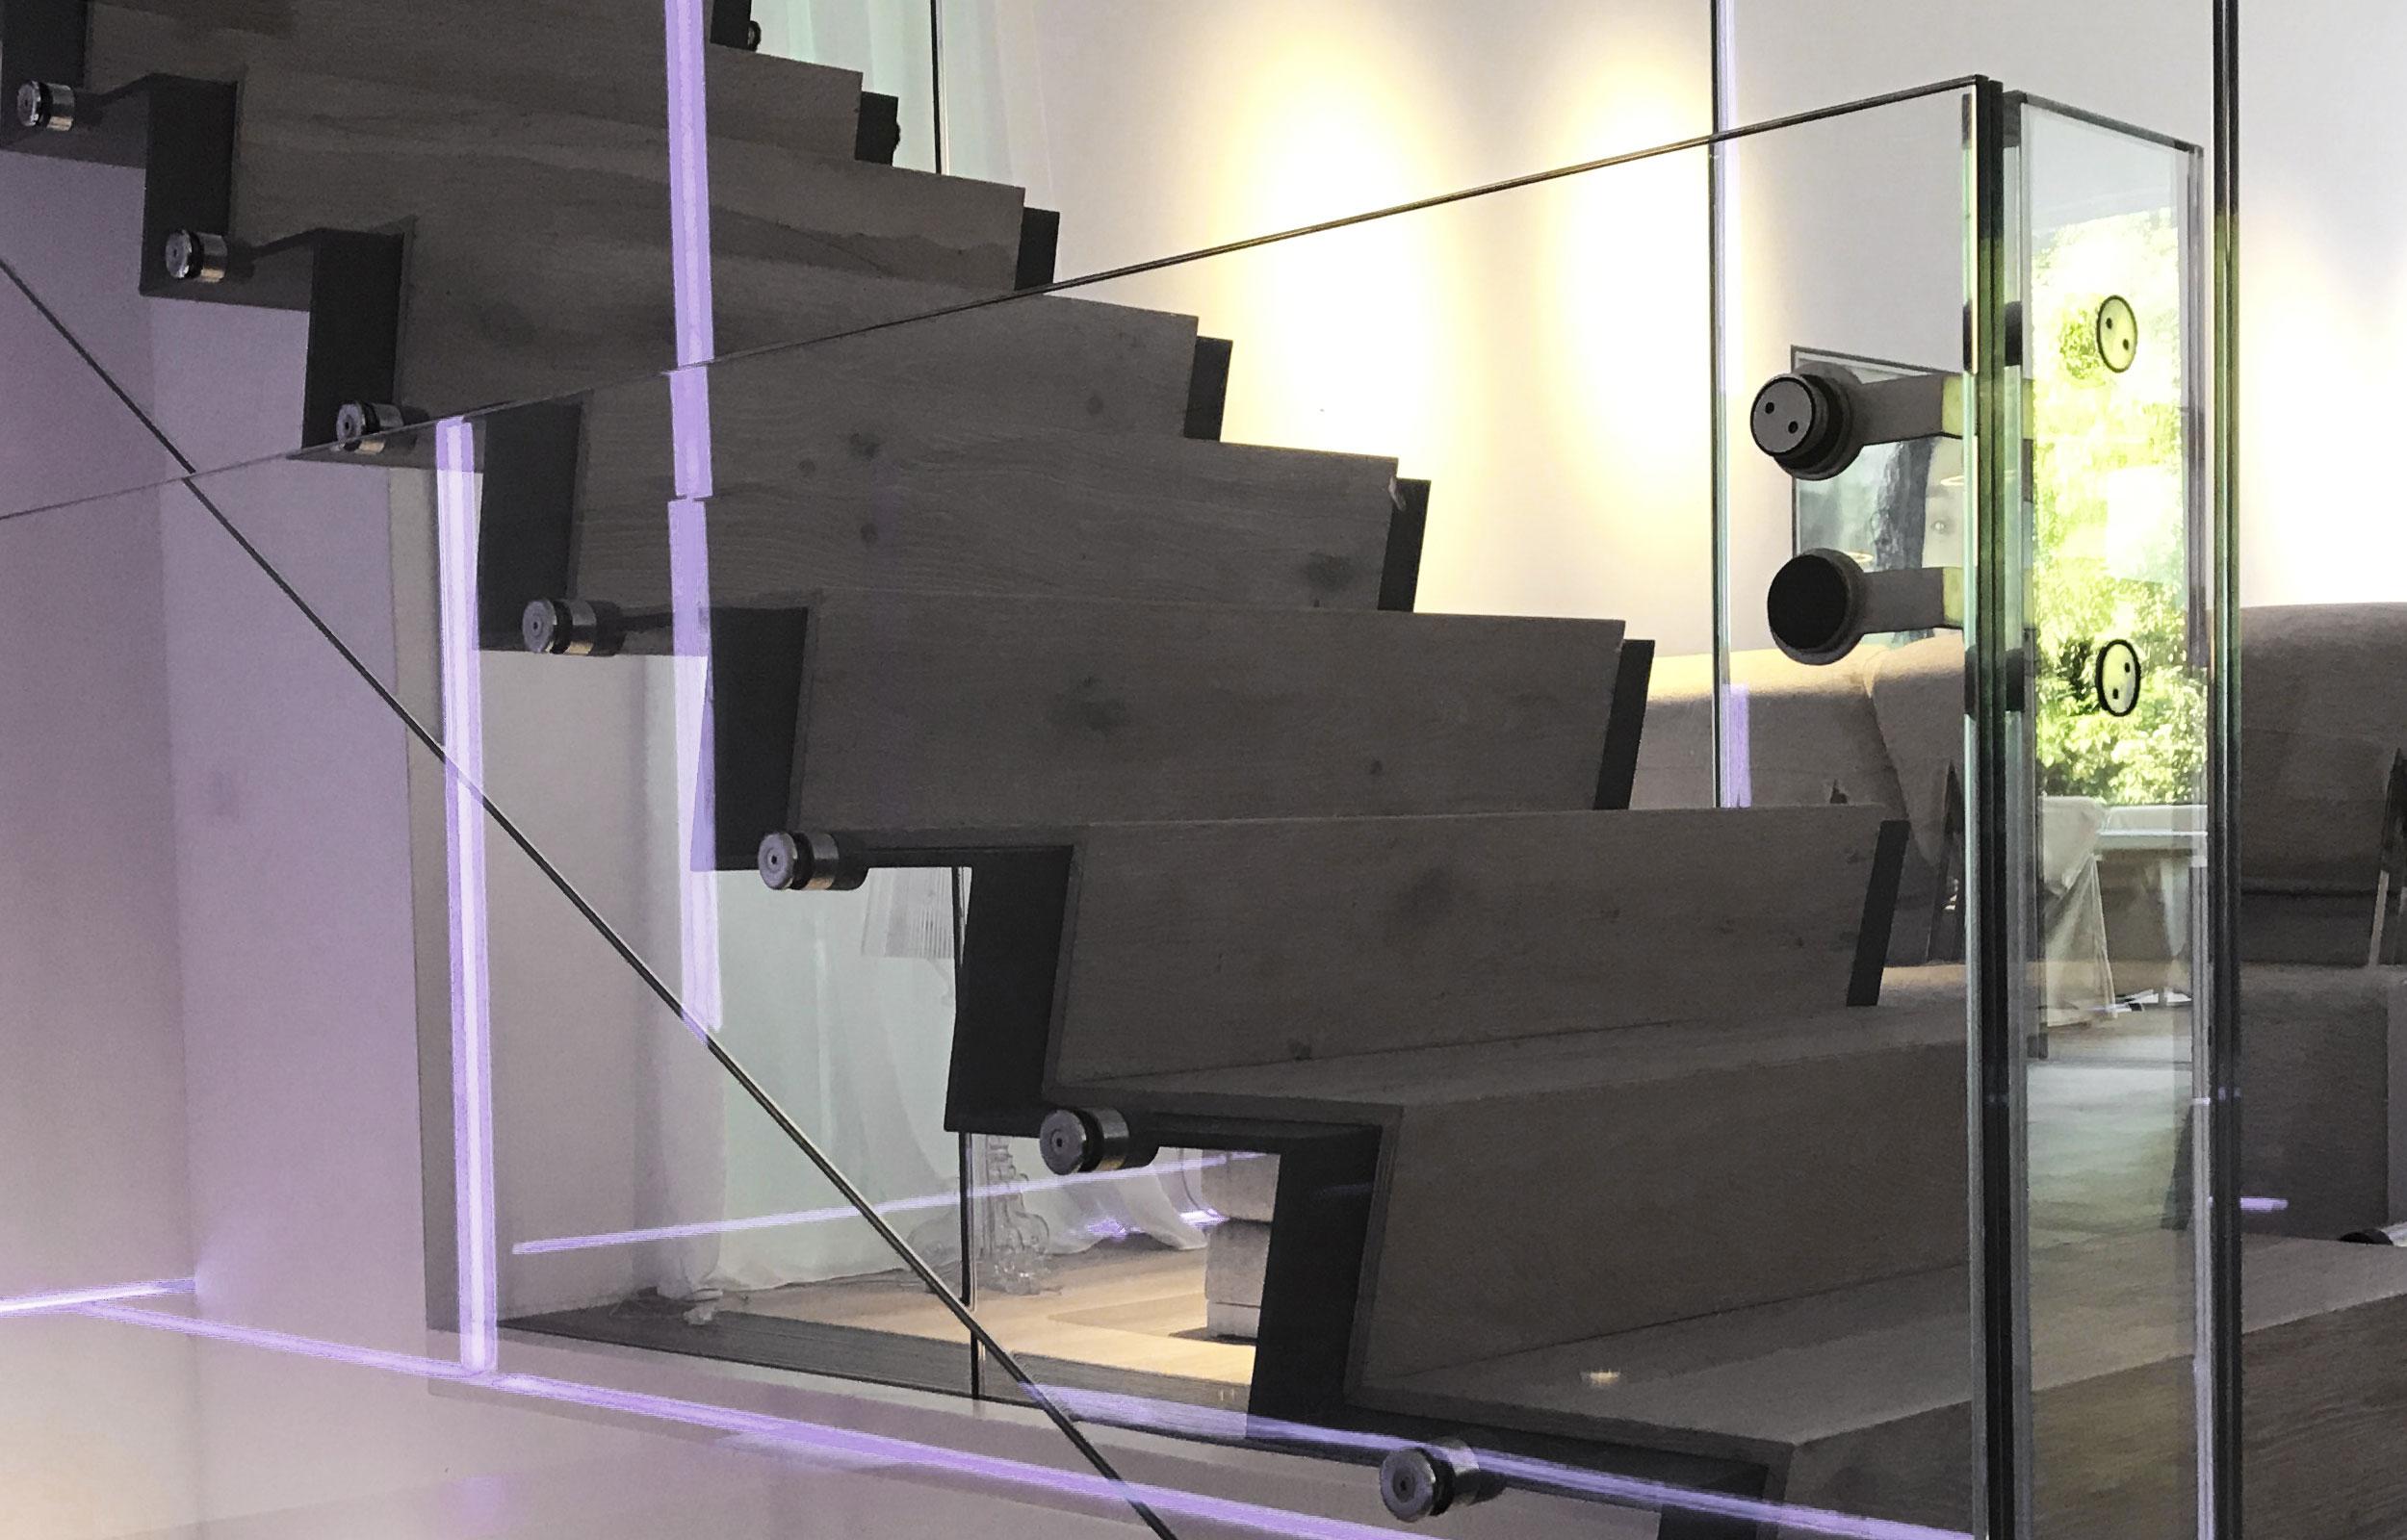 Scara metal otel trepte lemn balustrada sticla haute couture